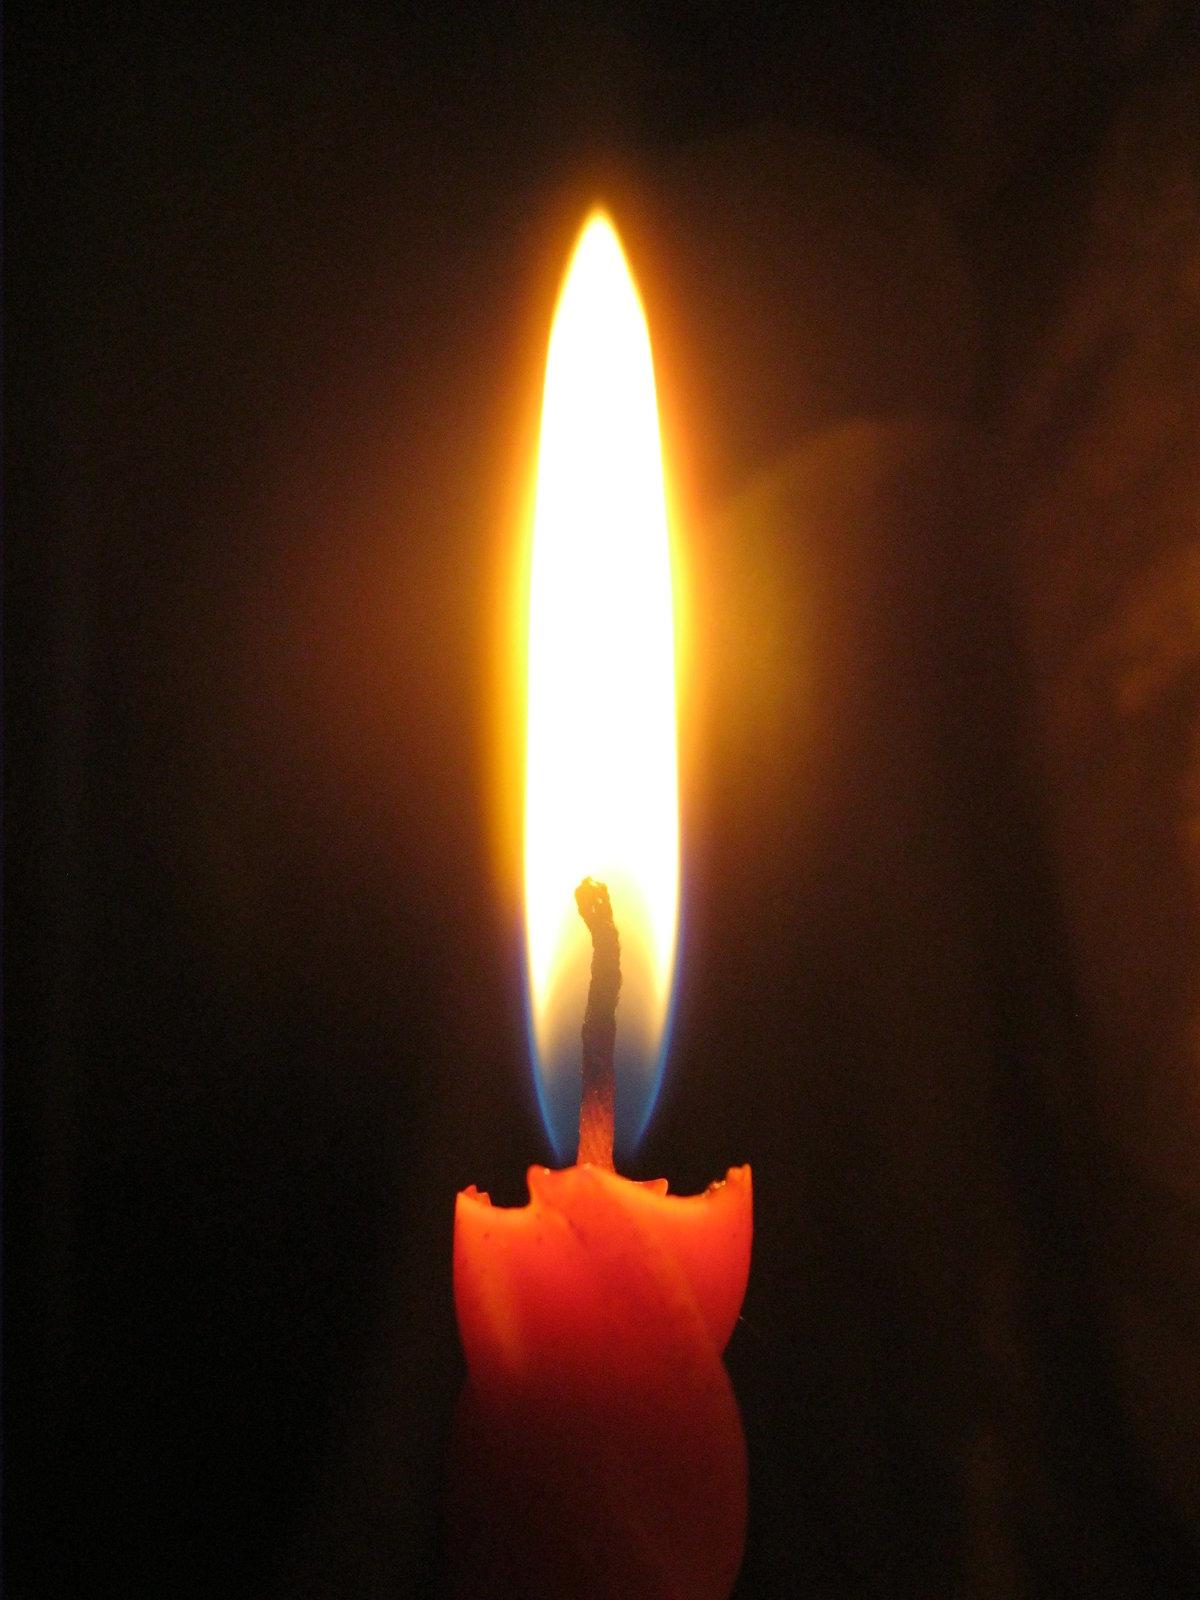 Фото горящей свечи скорби